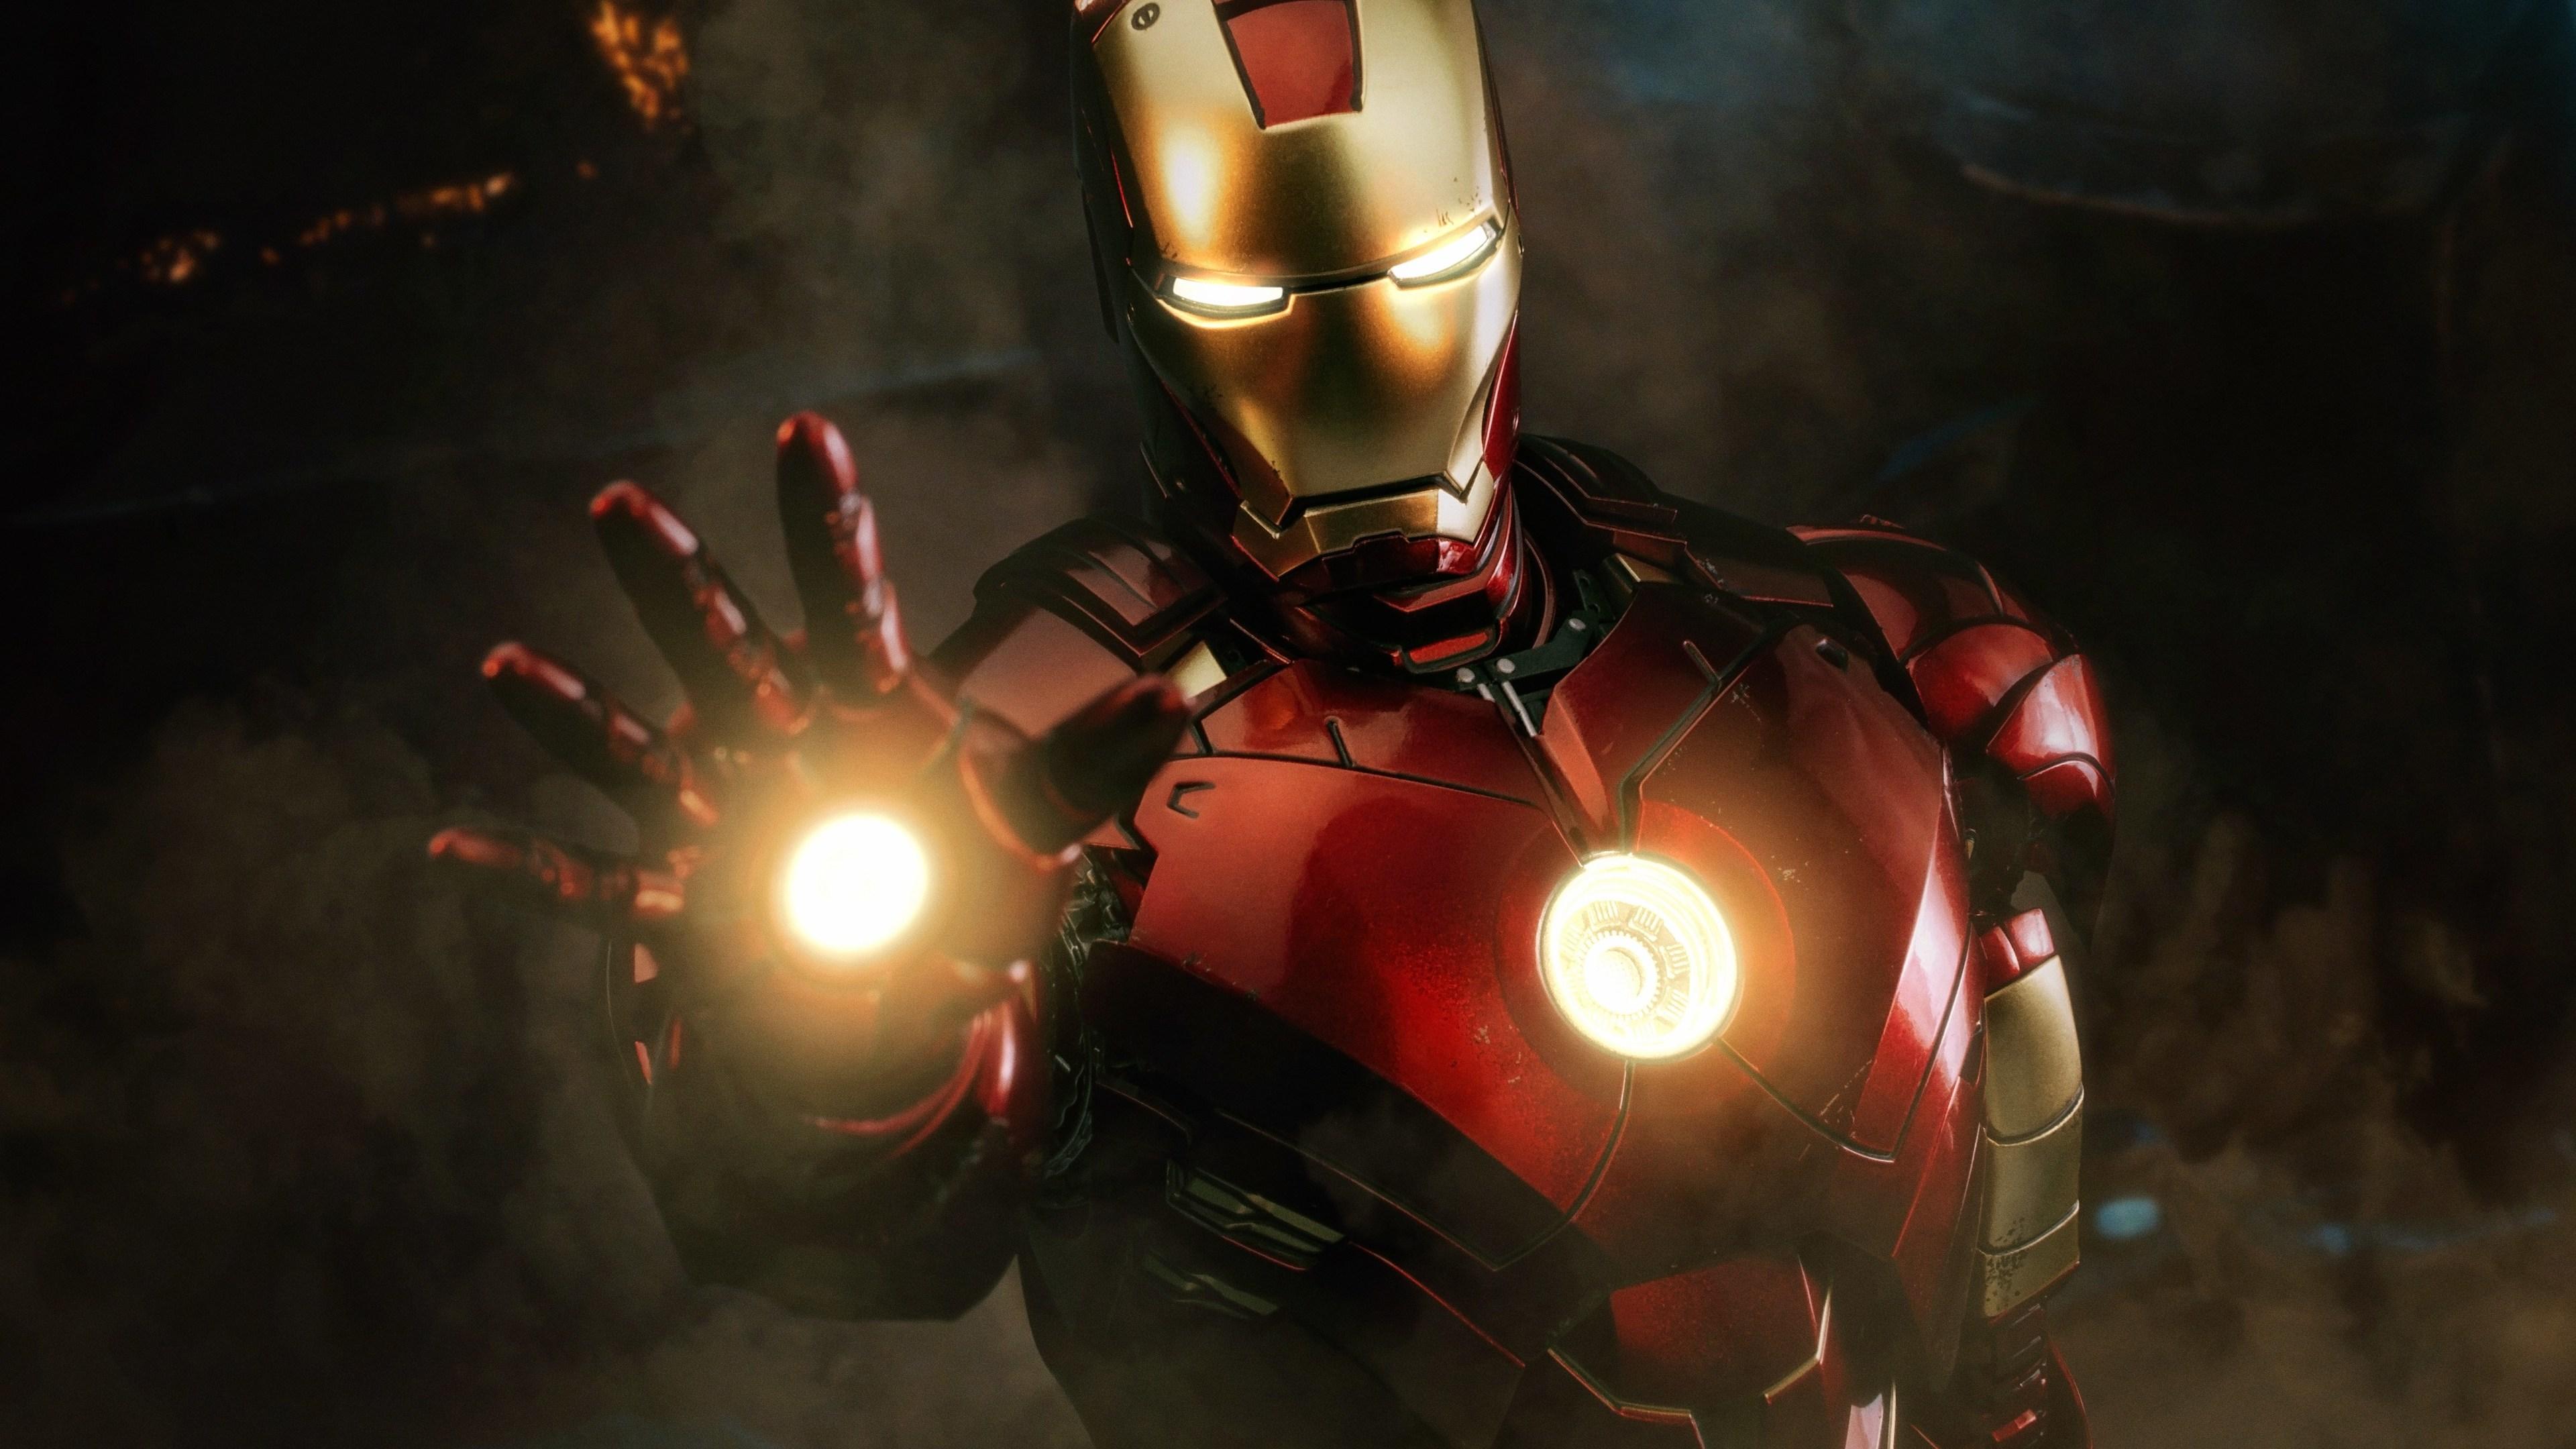 2018 iron man 4k 1537646062 - 2018 Iron Man 4k - superheroes wallpapers, iron man wallpapers, hd-wallpapers, 4k-wallpapers